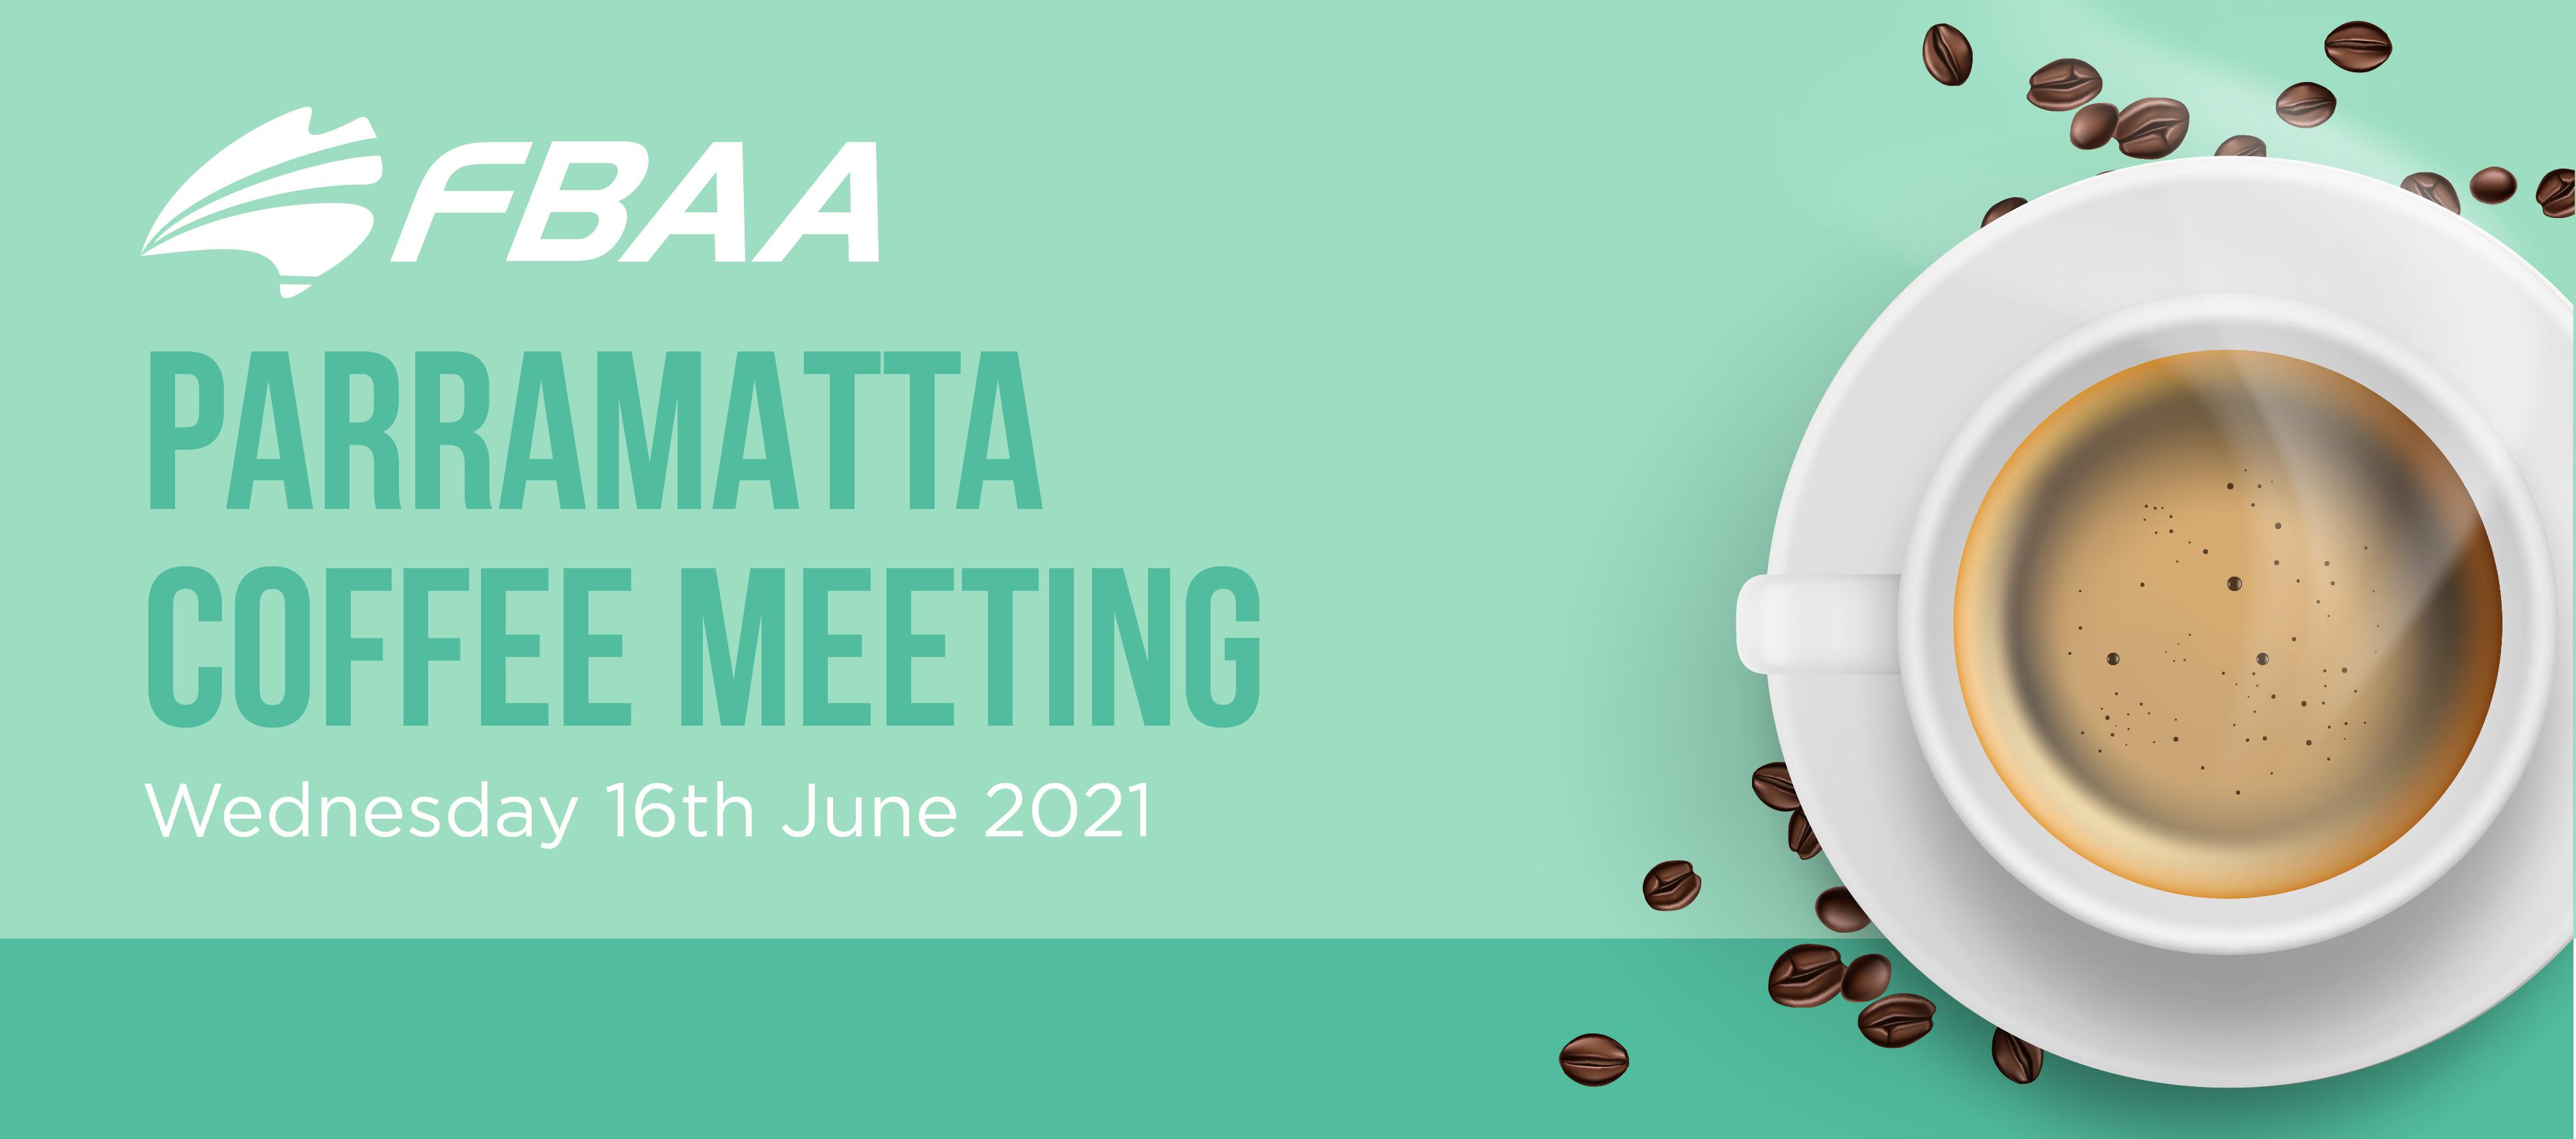 FBAA PARRAMATTA COFFEE MEET 2021